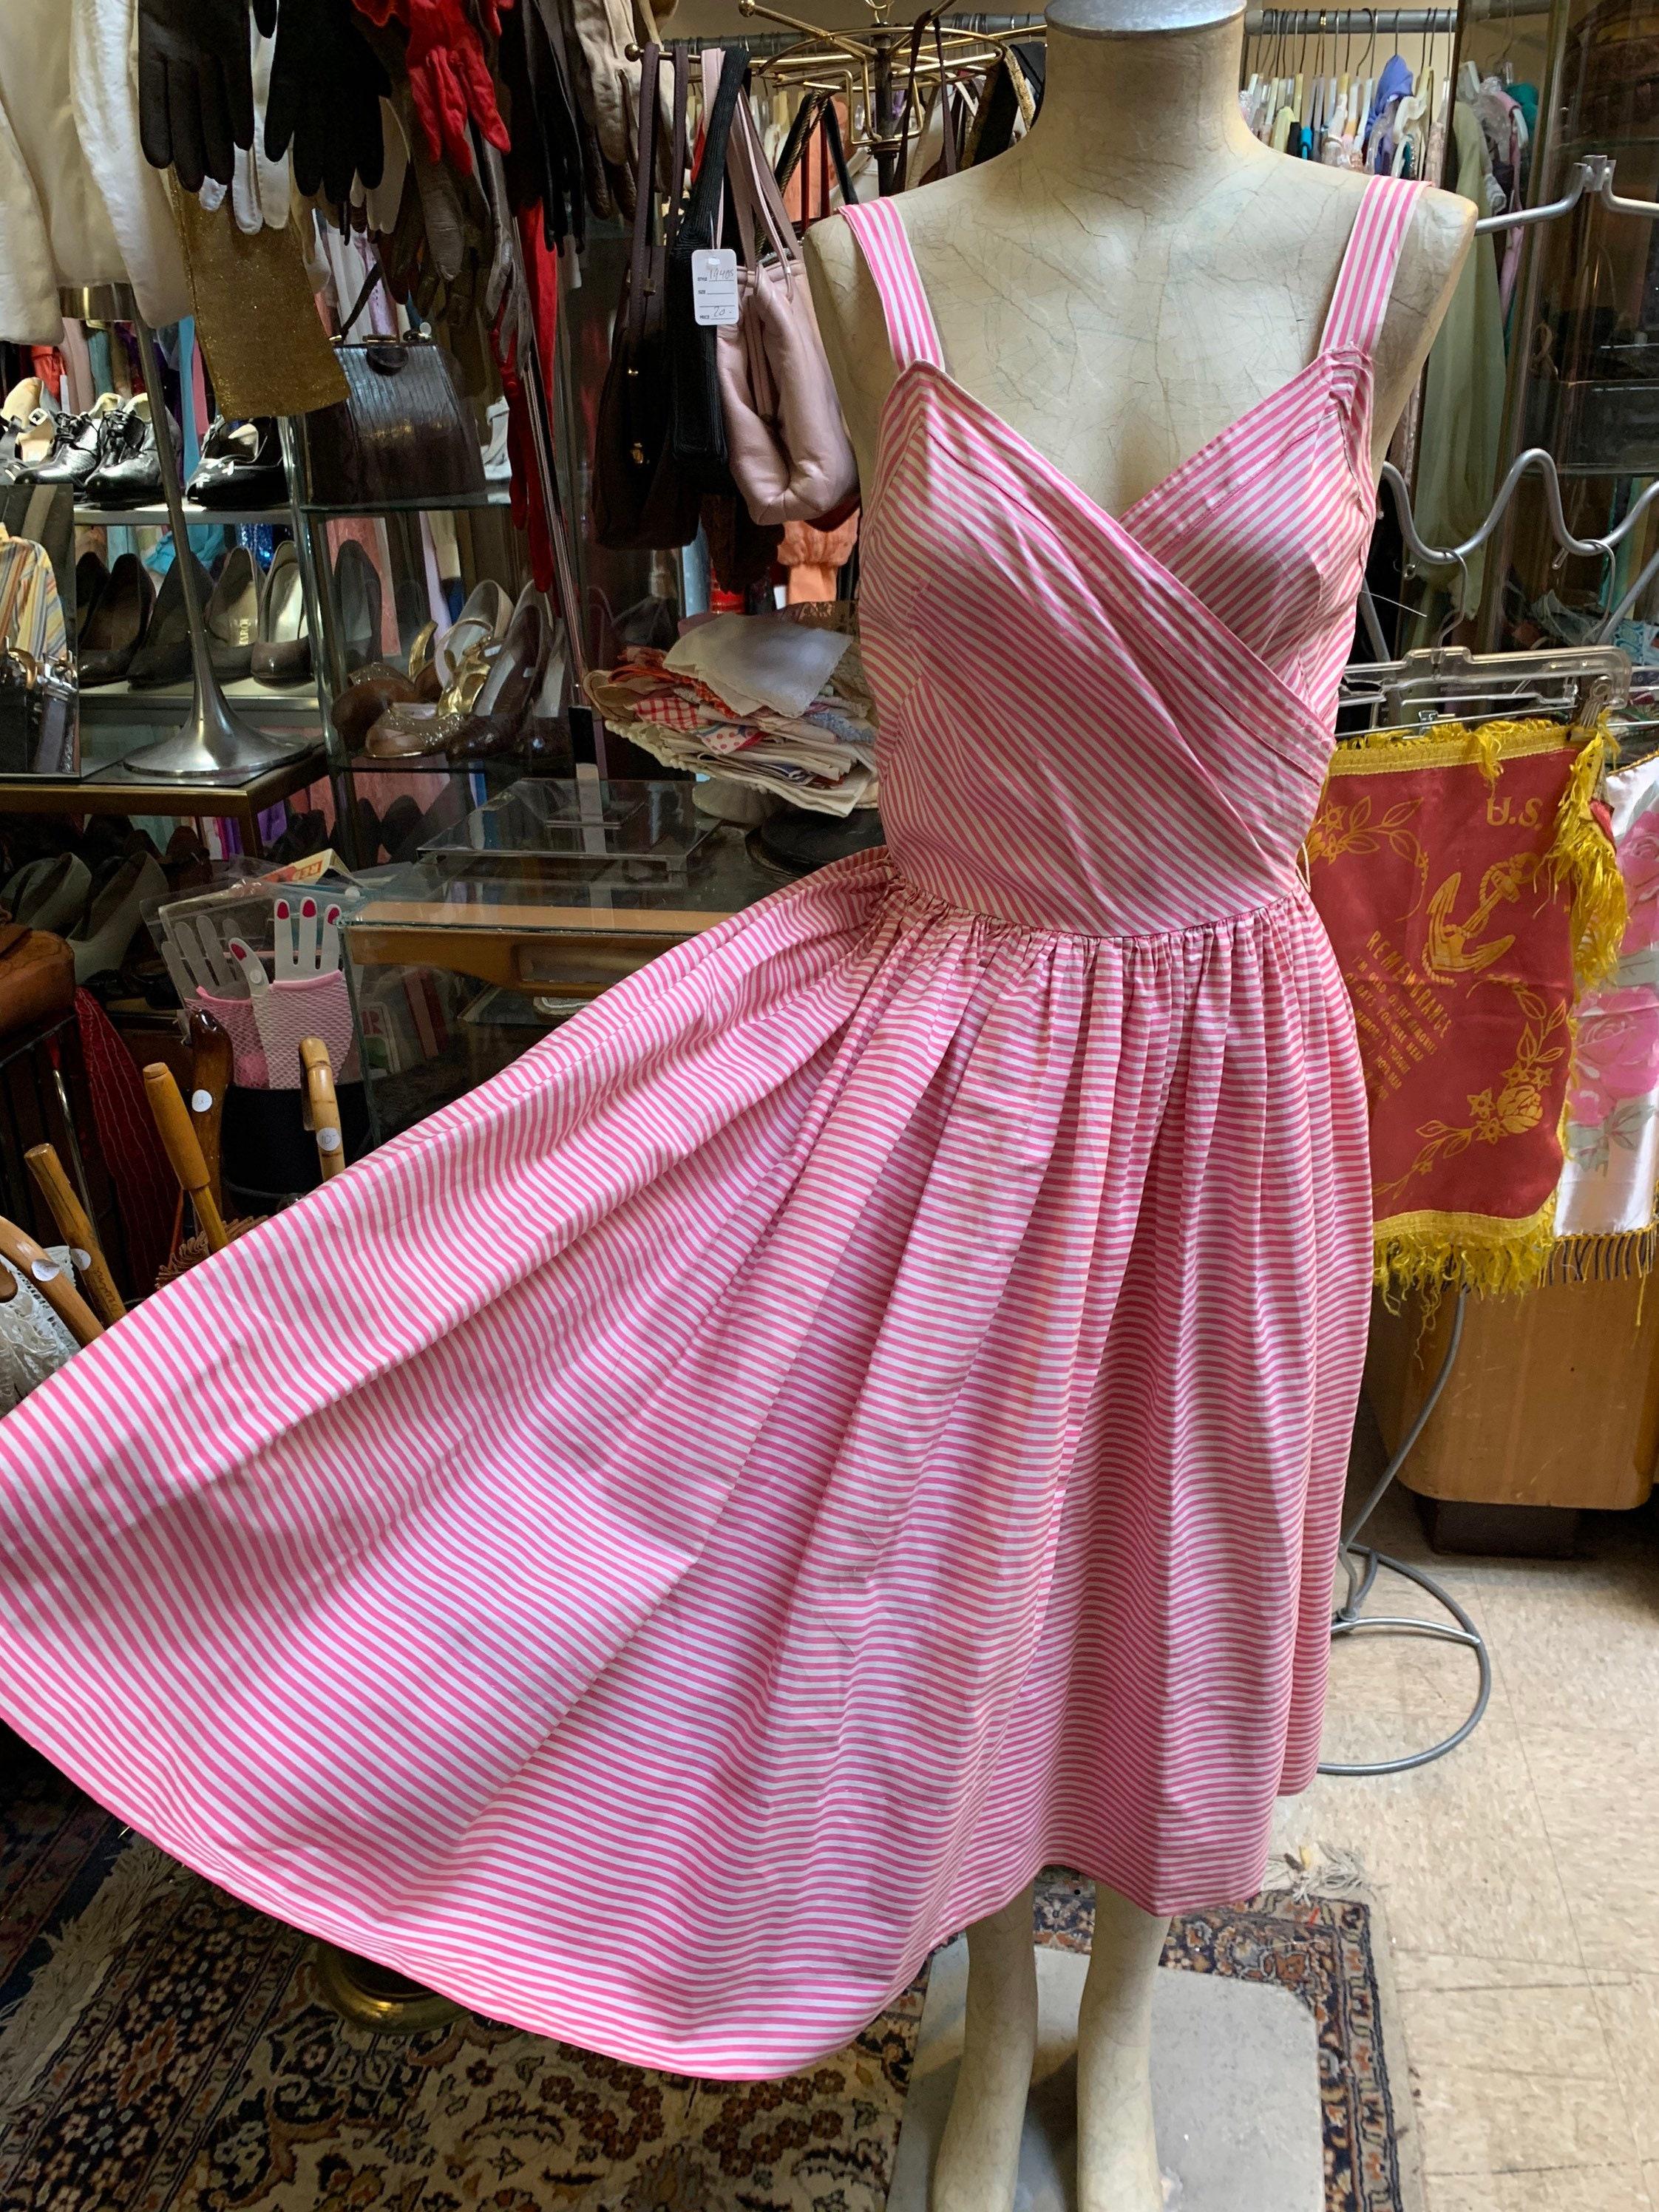 1950s Hats: Pillbox, Fascinator, Wedding, Sun Hats Candy Pink Perfect Cotton 1950S Summer Dress $22.00 AT vintagedancer.com